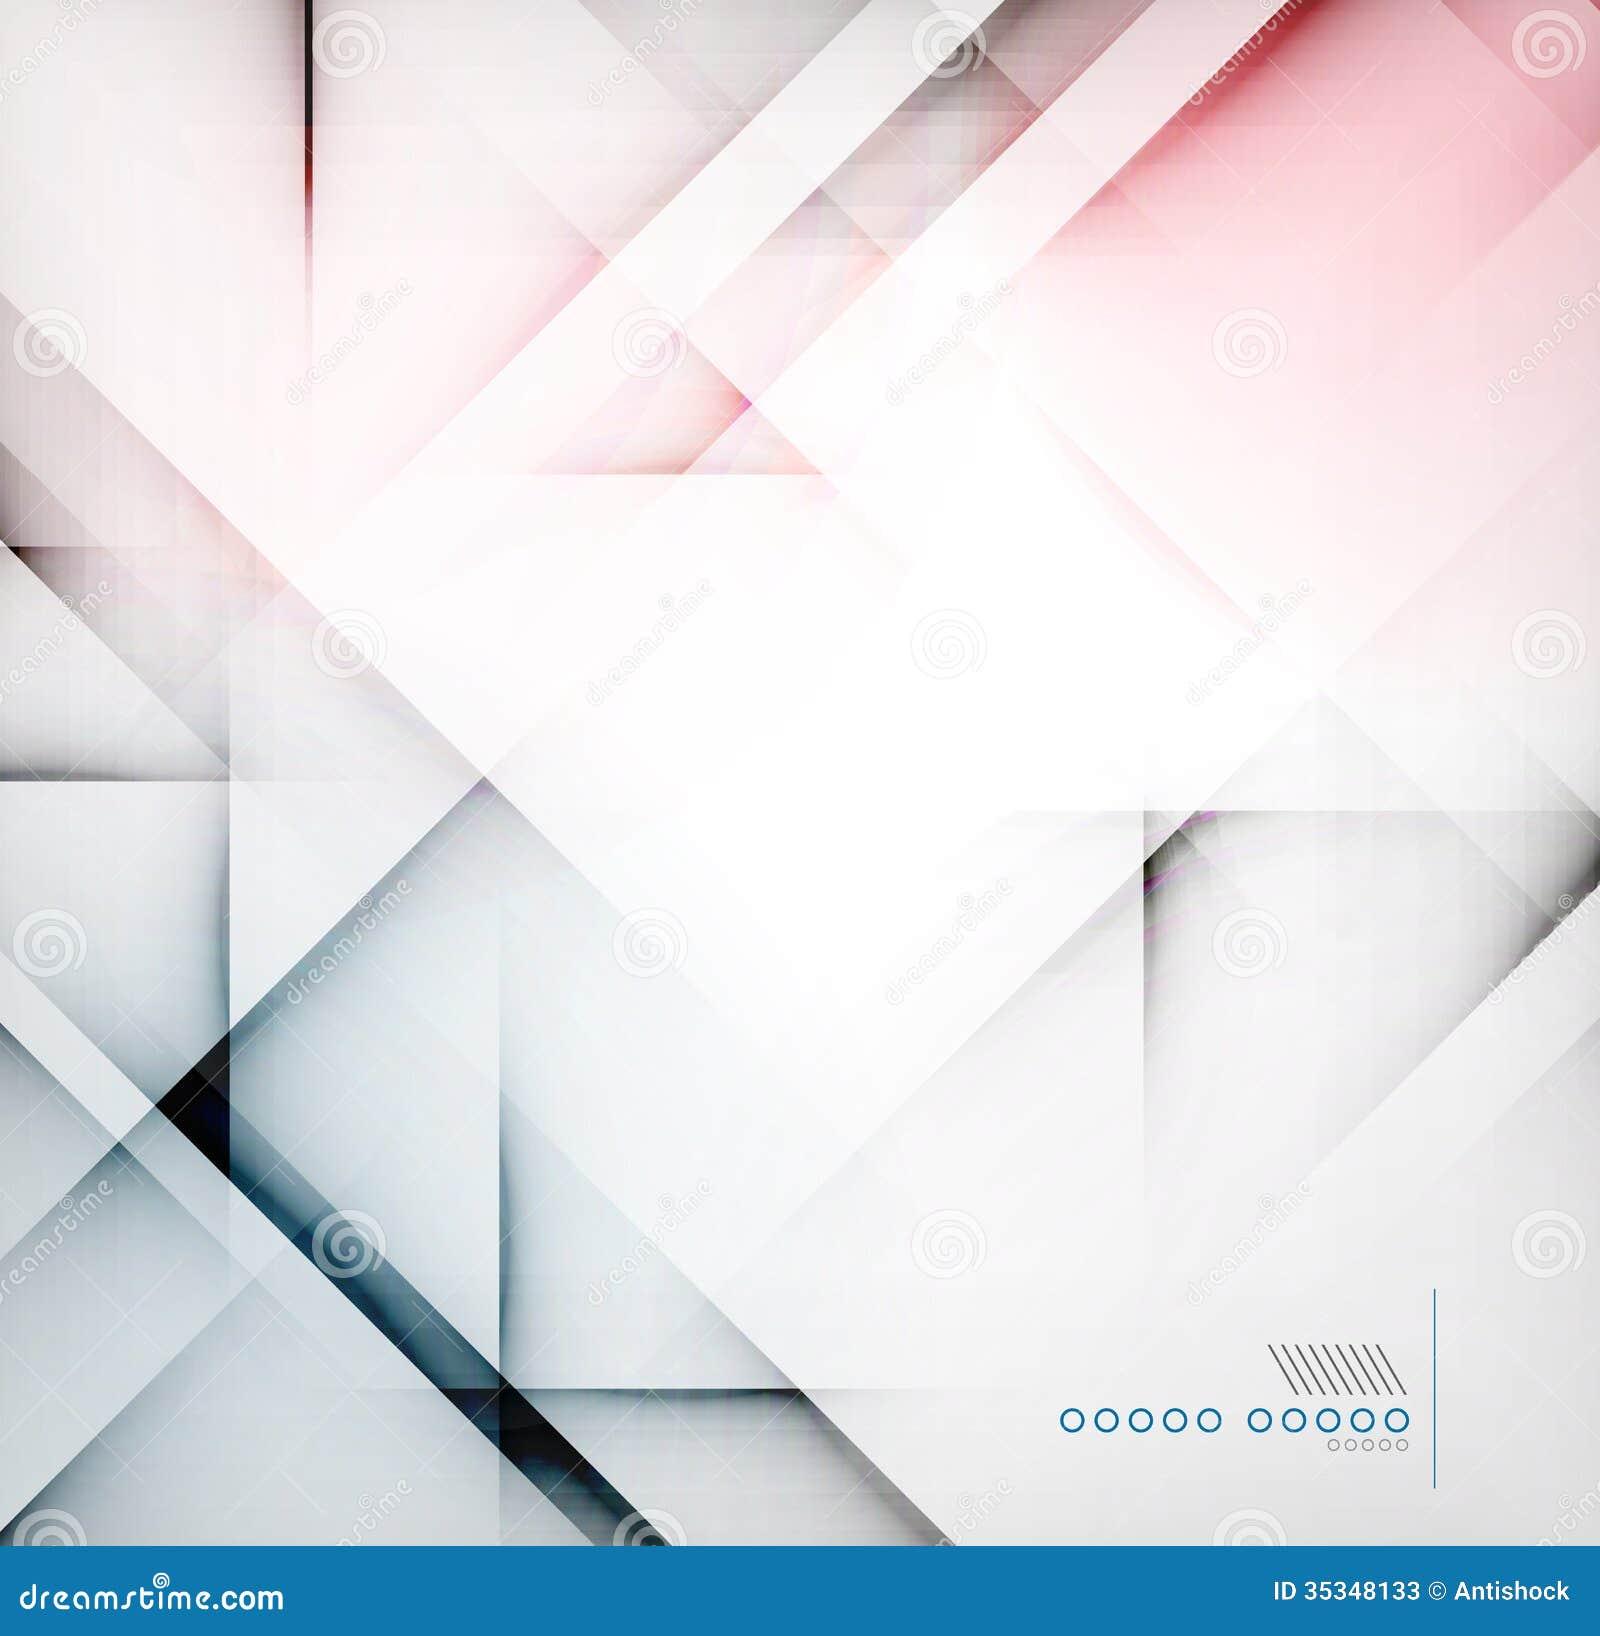 geometric diamond shape abstract background stock photos